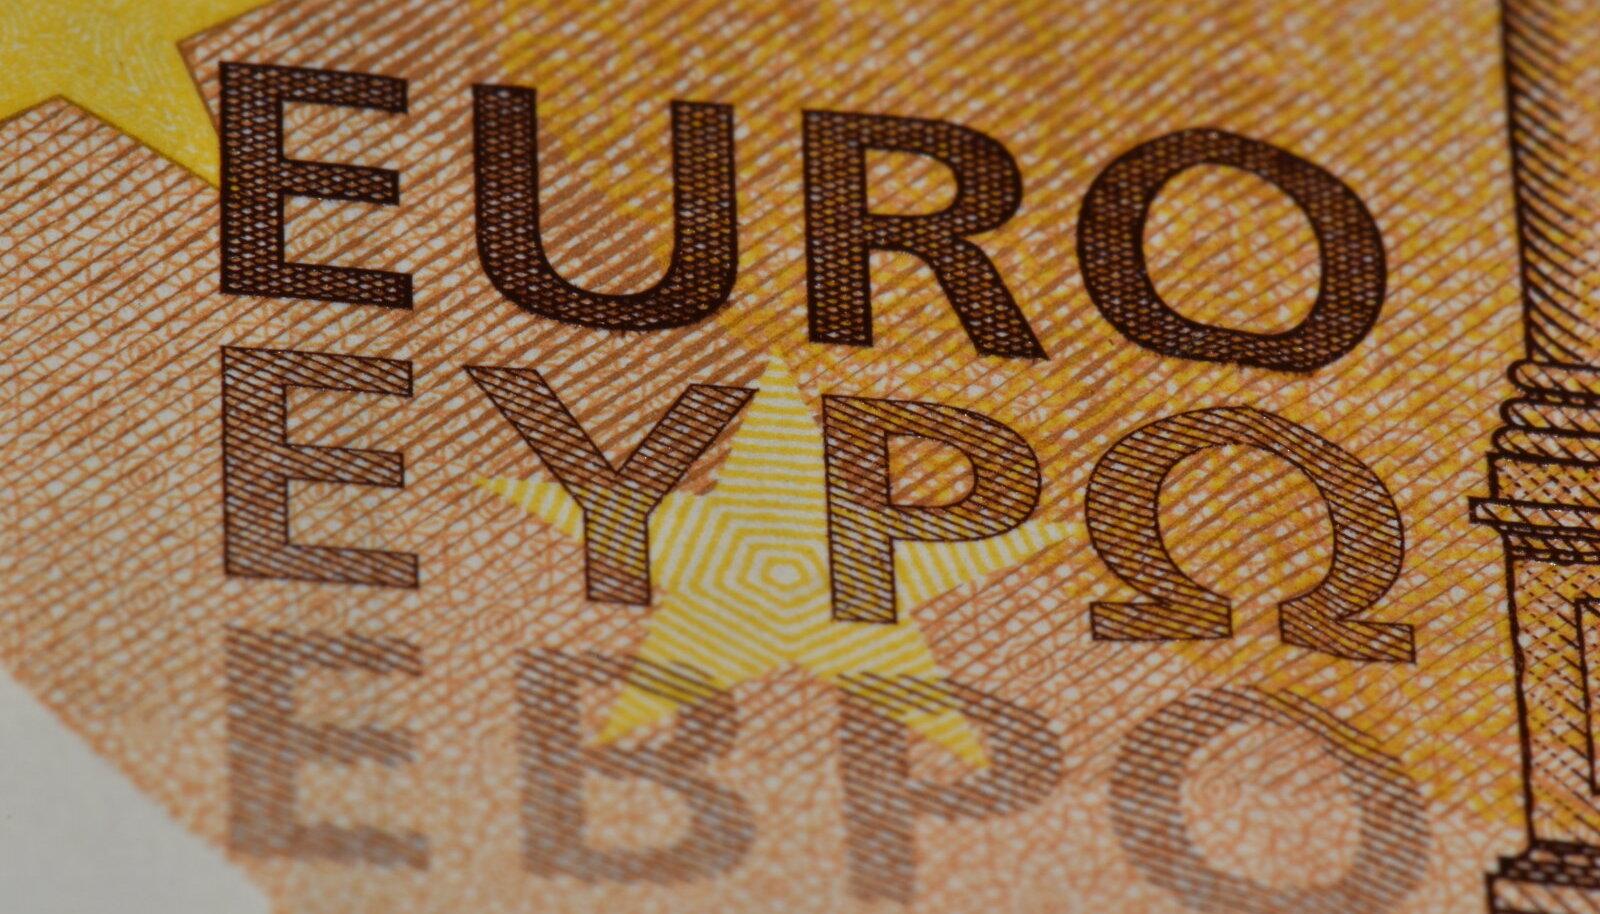 50-eurone